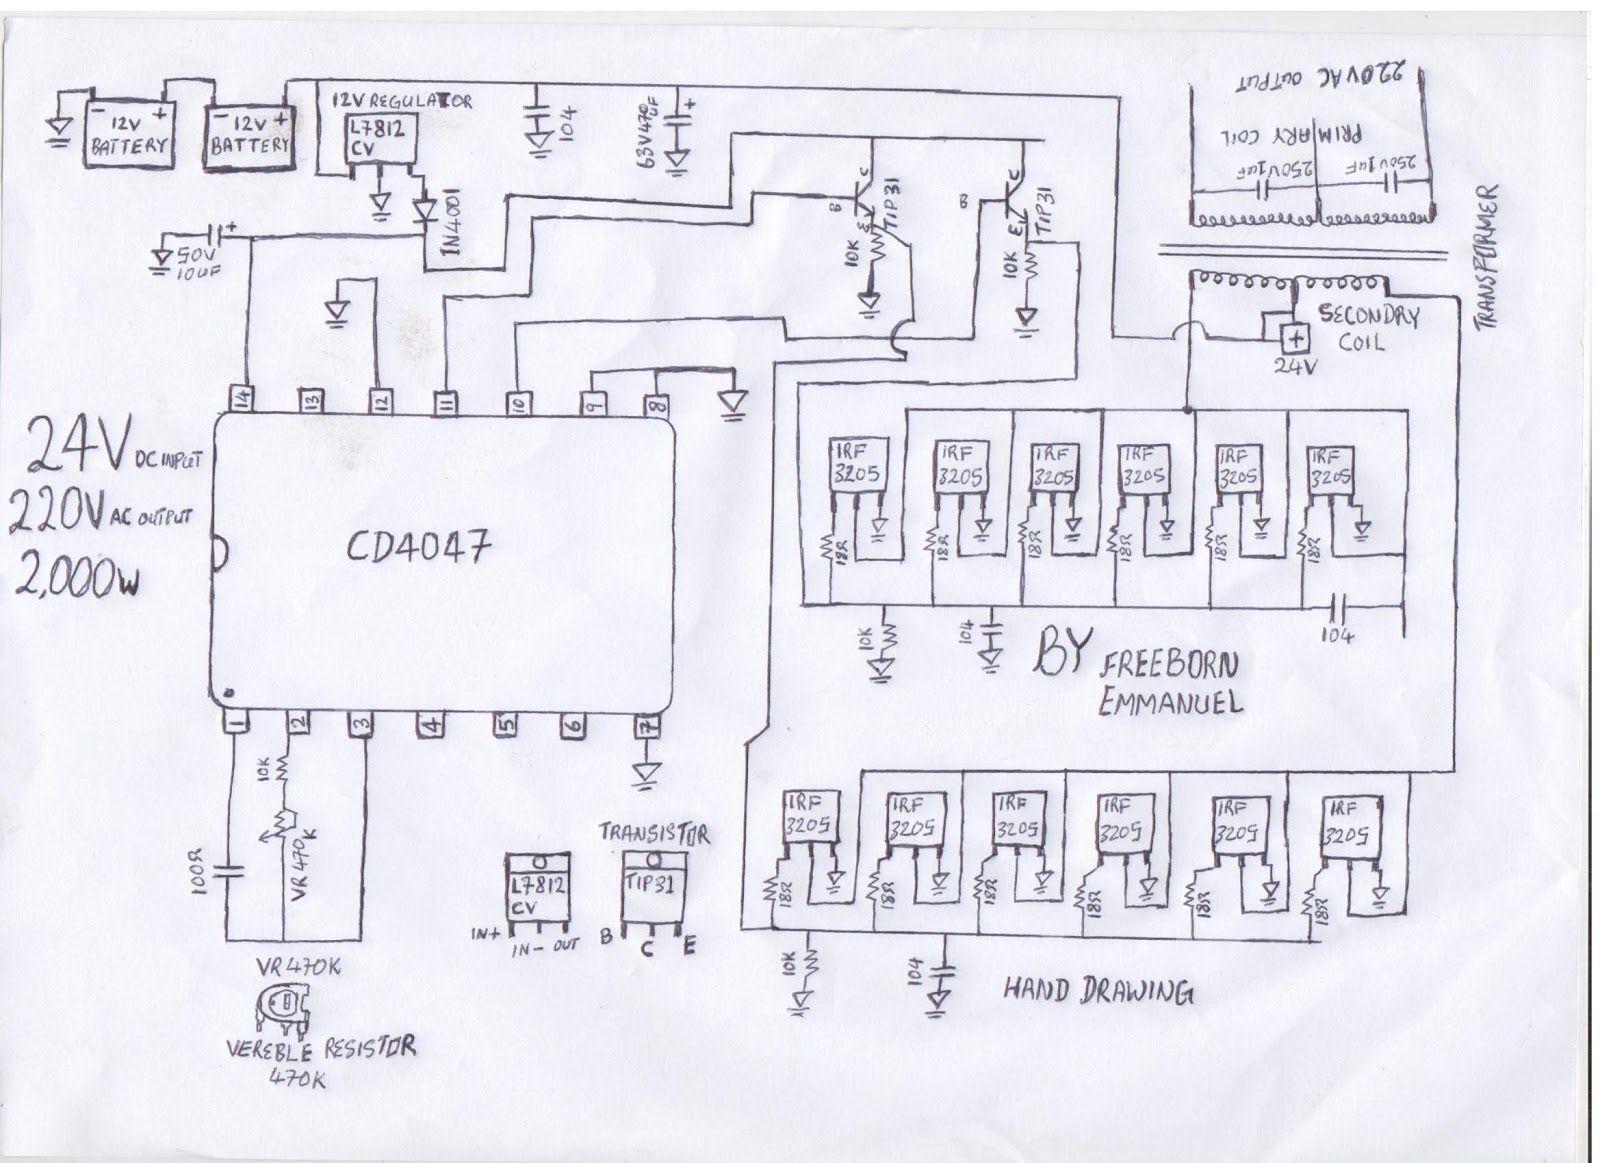 [DIAGRAM_1JK]  how to build a 2KVA inverter circuit diagram : 2000 watt inverter circuit  diagram/ 24V 2KVA ci… in 2020 | Circuit diagram, Electrical circuit diagram,  Electronic schematics | 2000 W Inverter Circuit Diagram |  | Pinterest